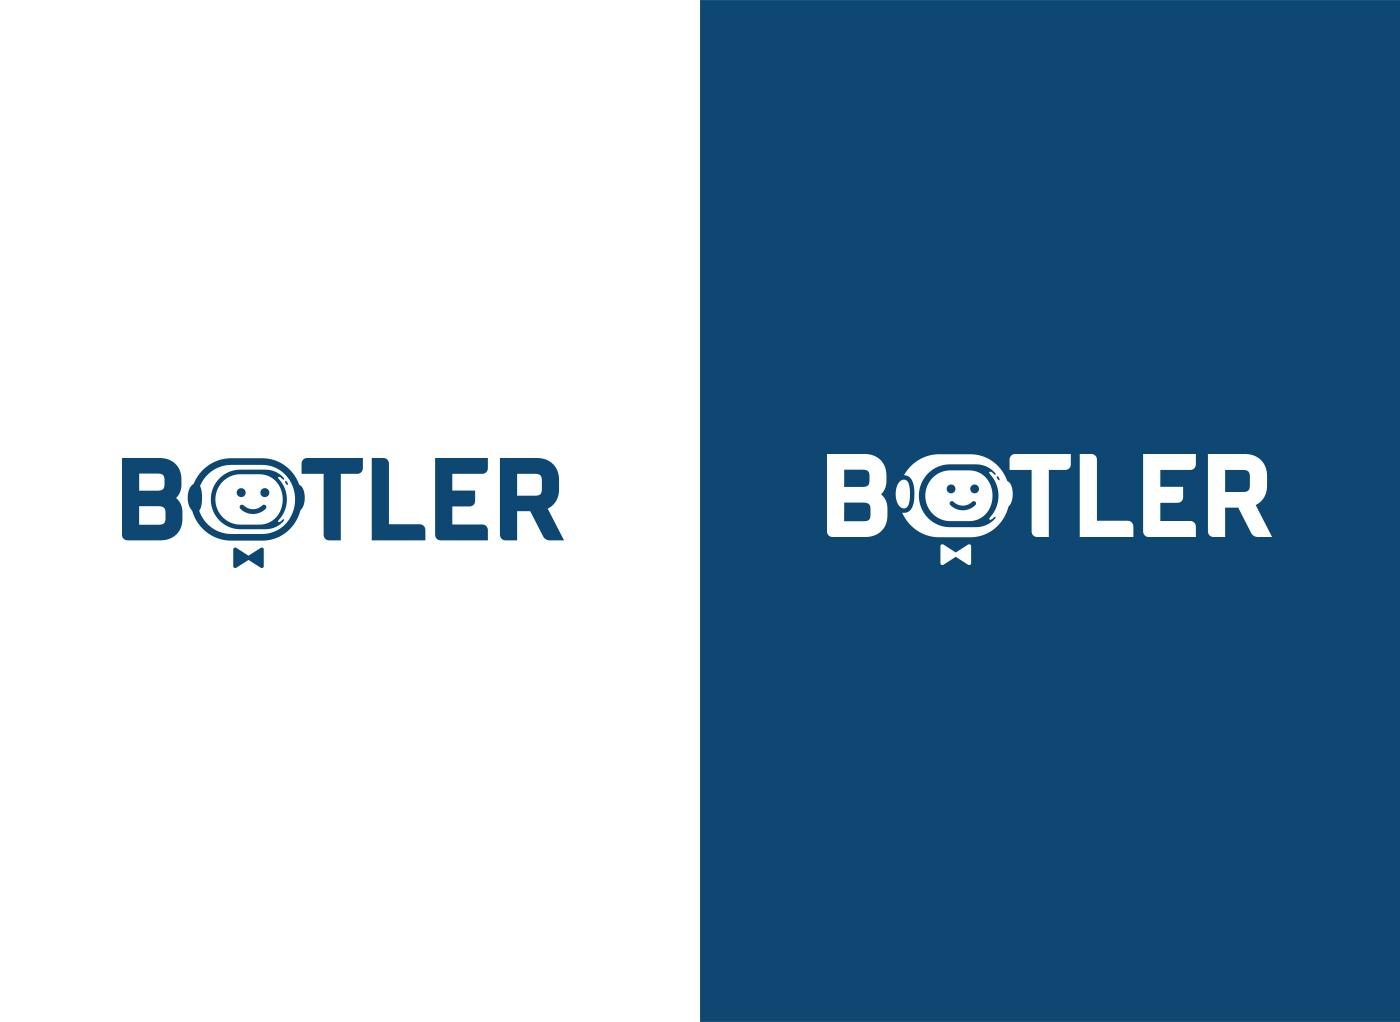 Botler horizontal logo design